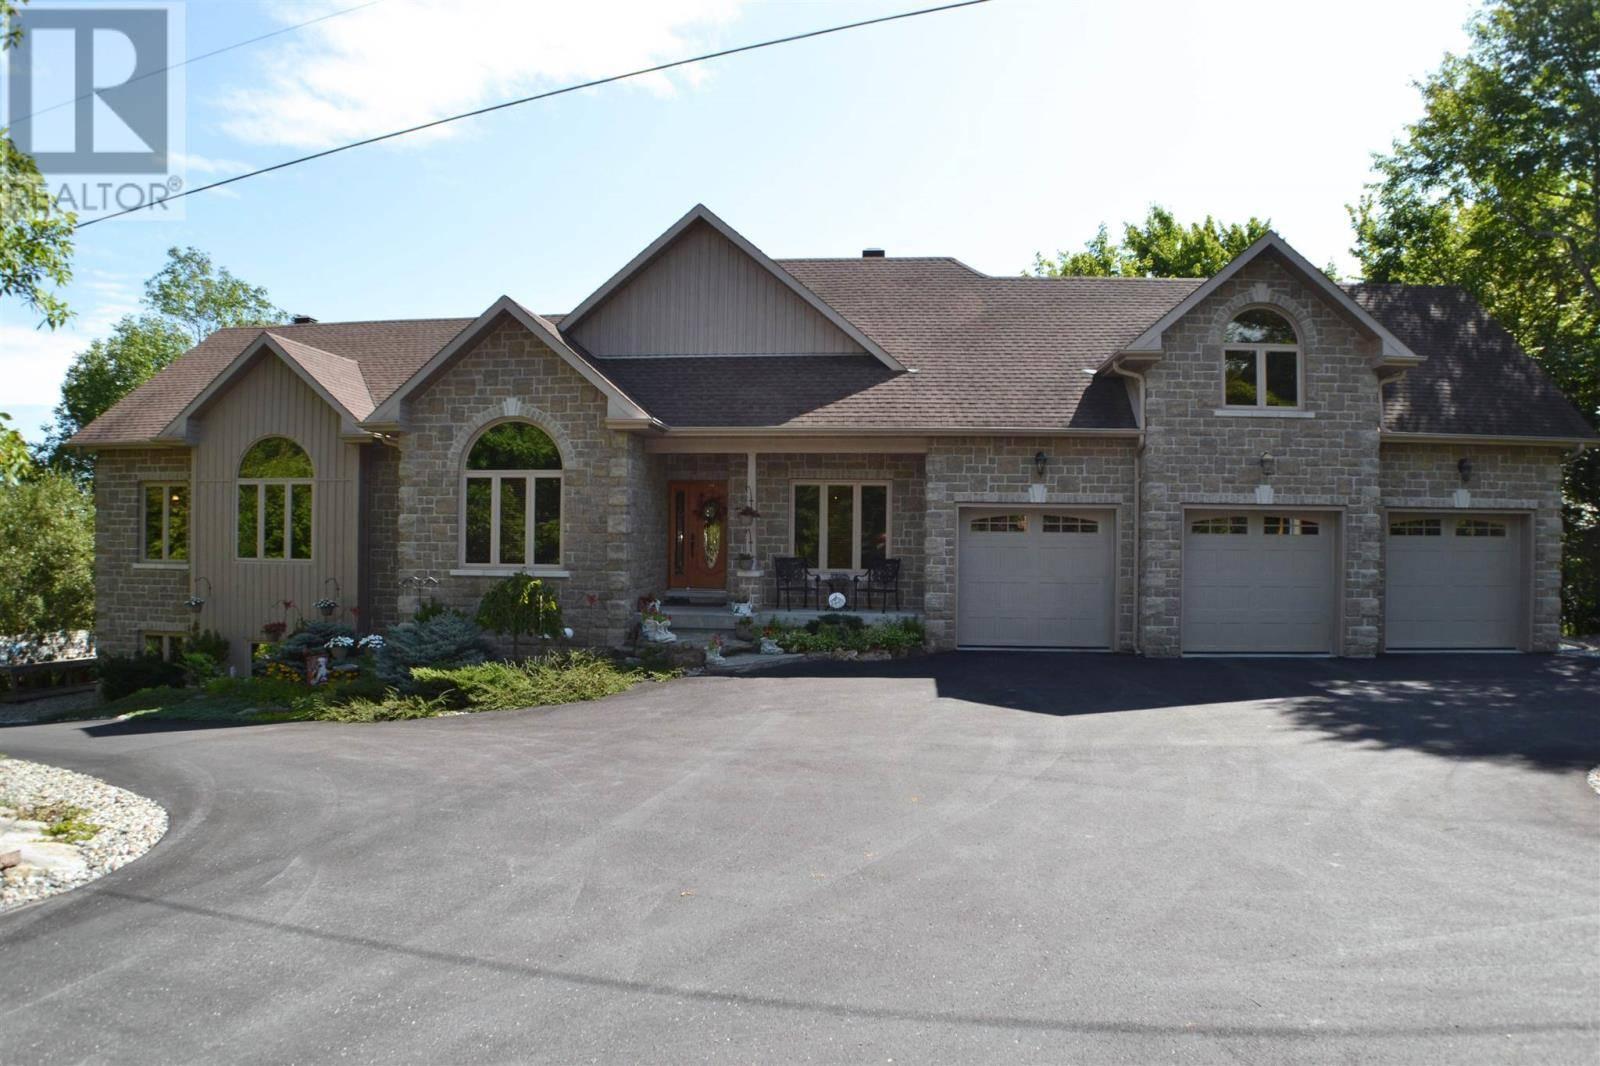 House for sale at 4194 Hiawatha Ln South Frontenac Ontario - MLS: K20001494